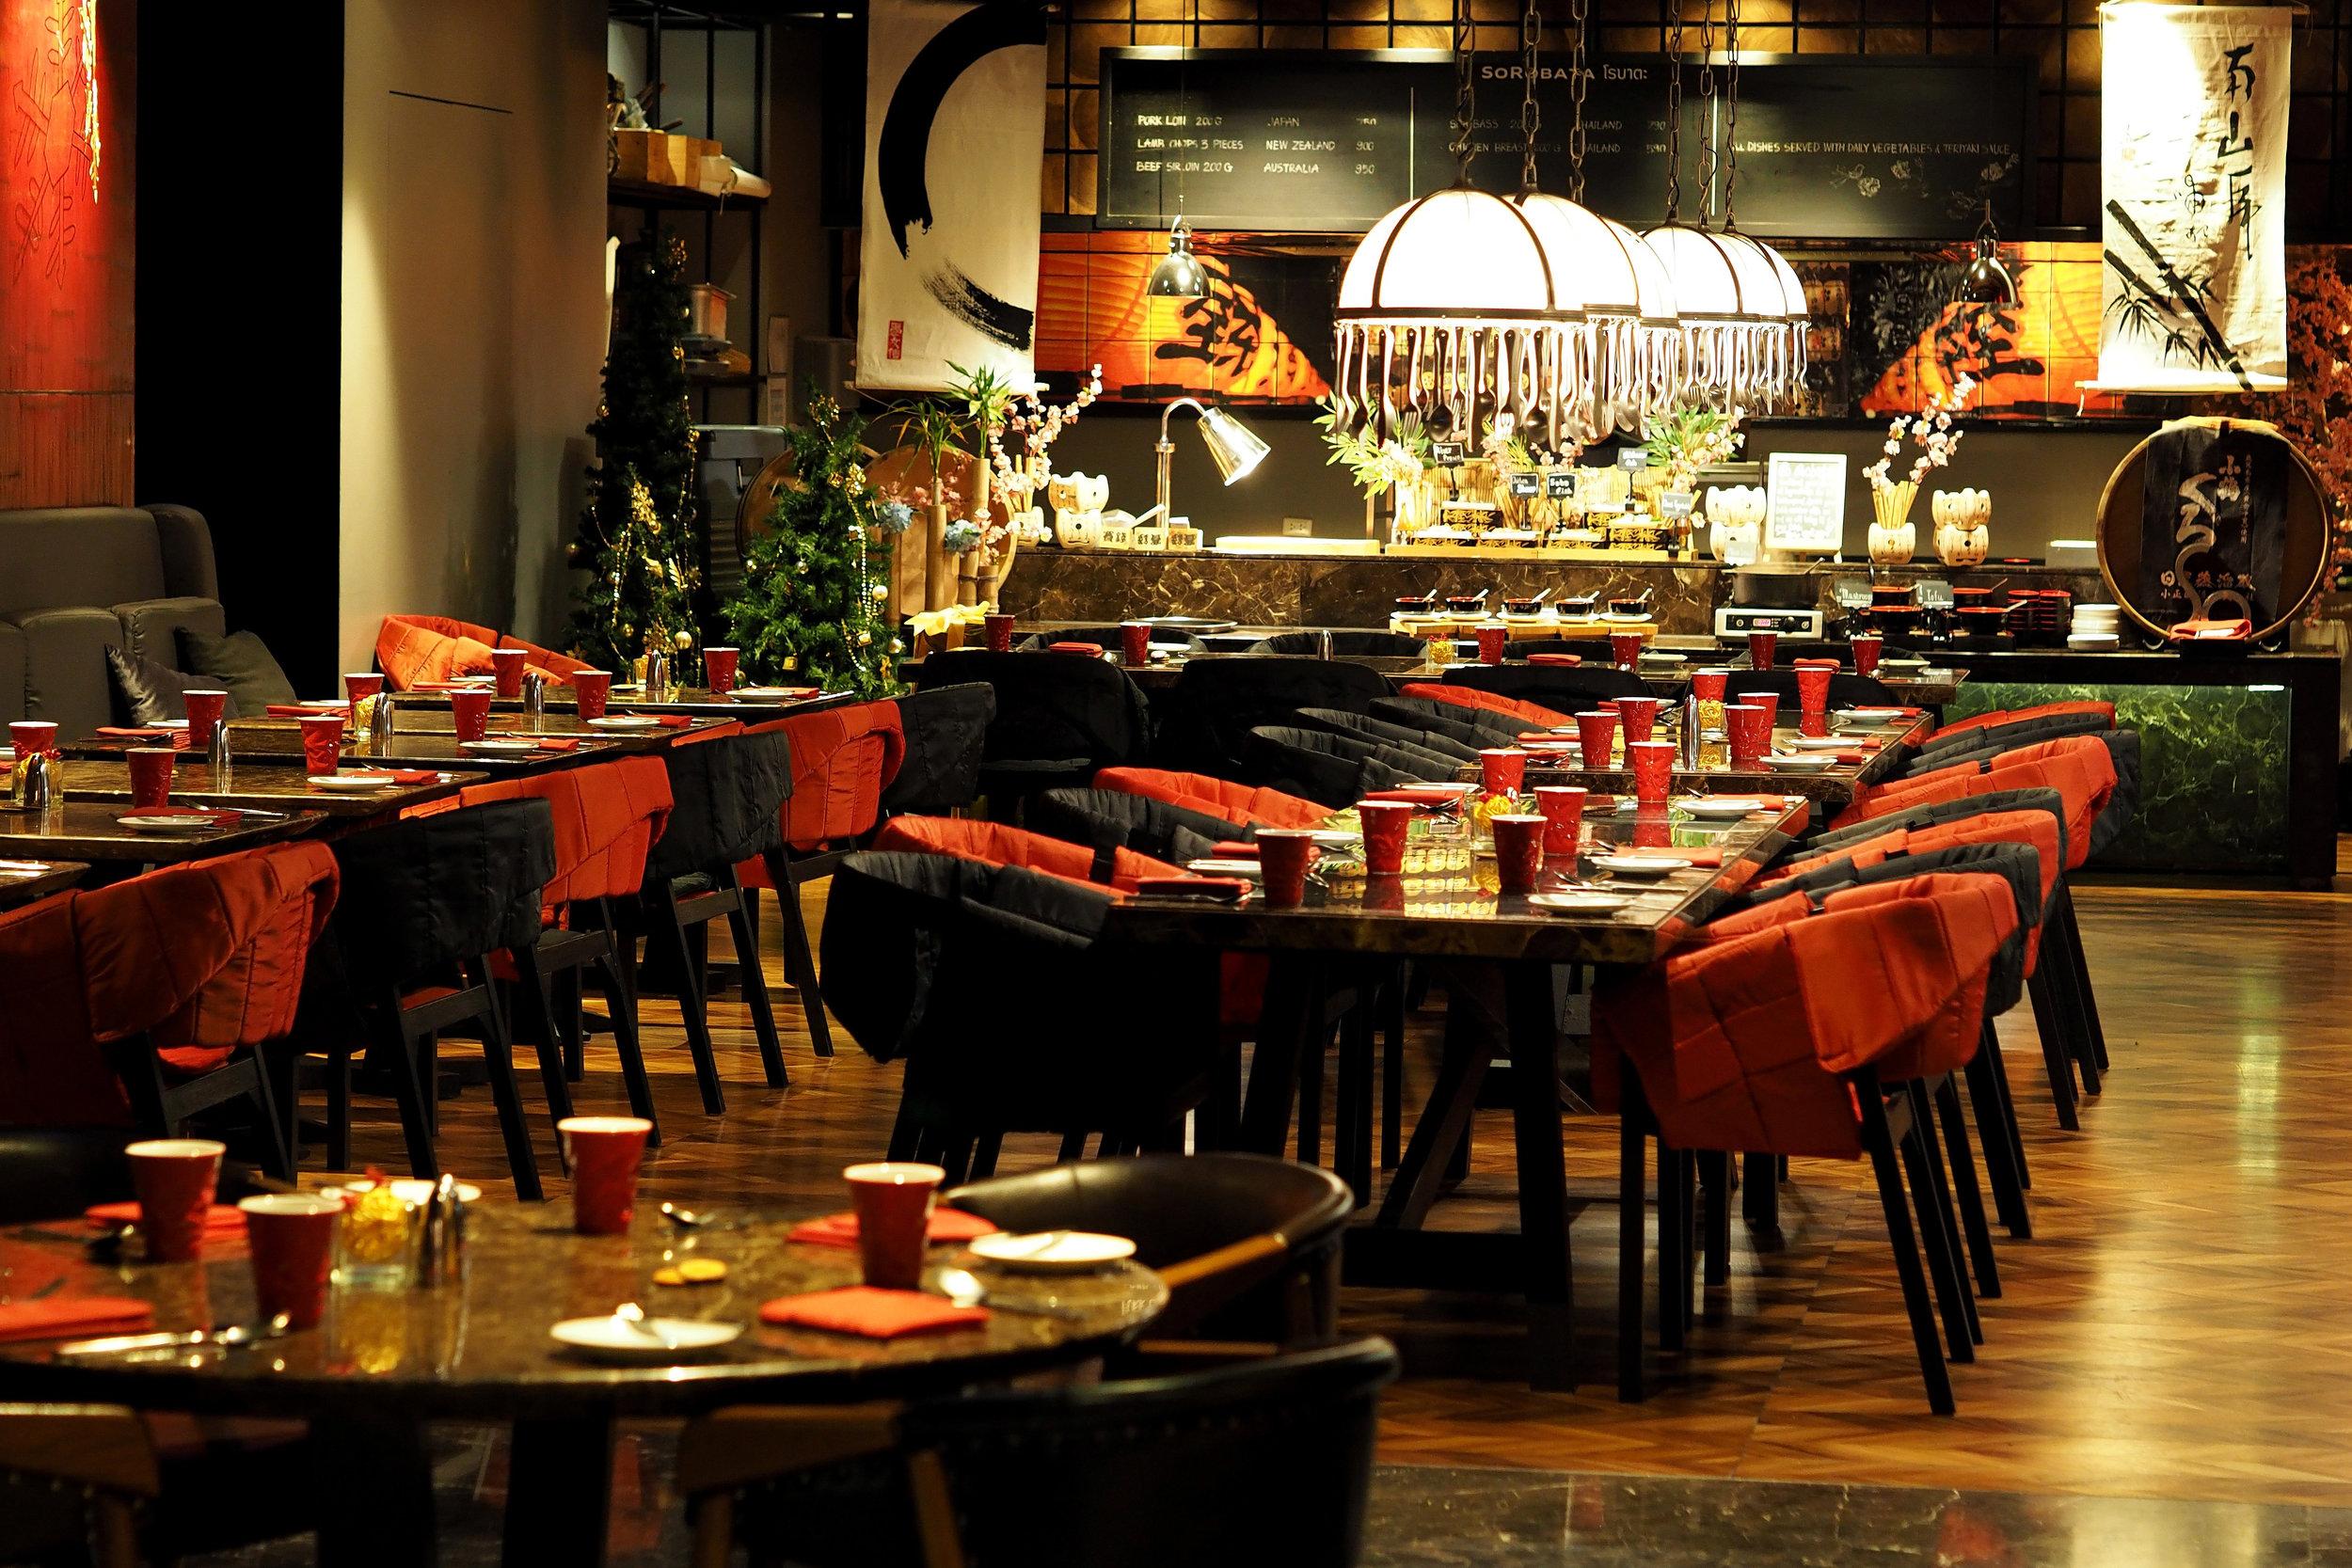 restaurant-in-bangkok-thailand.jpg